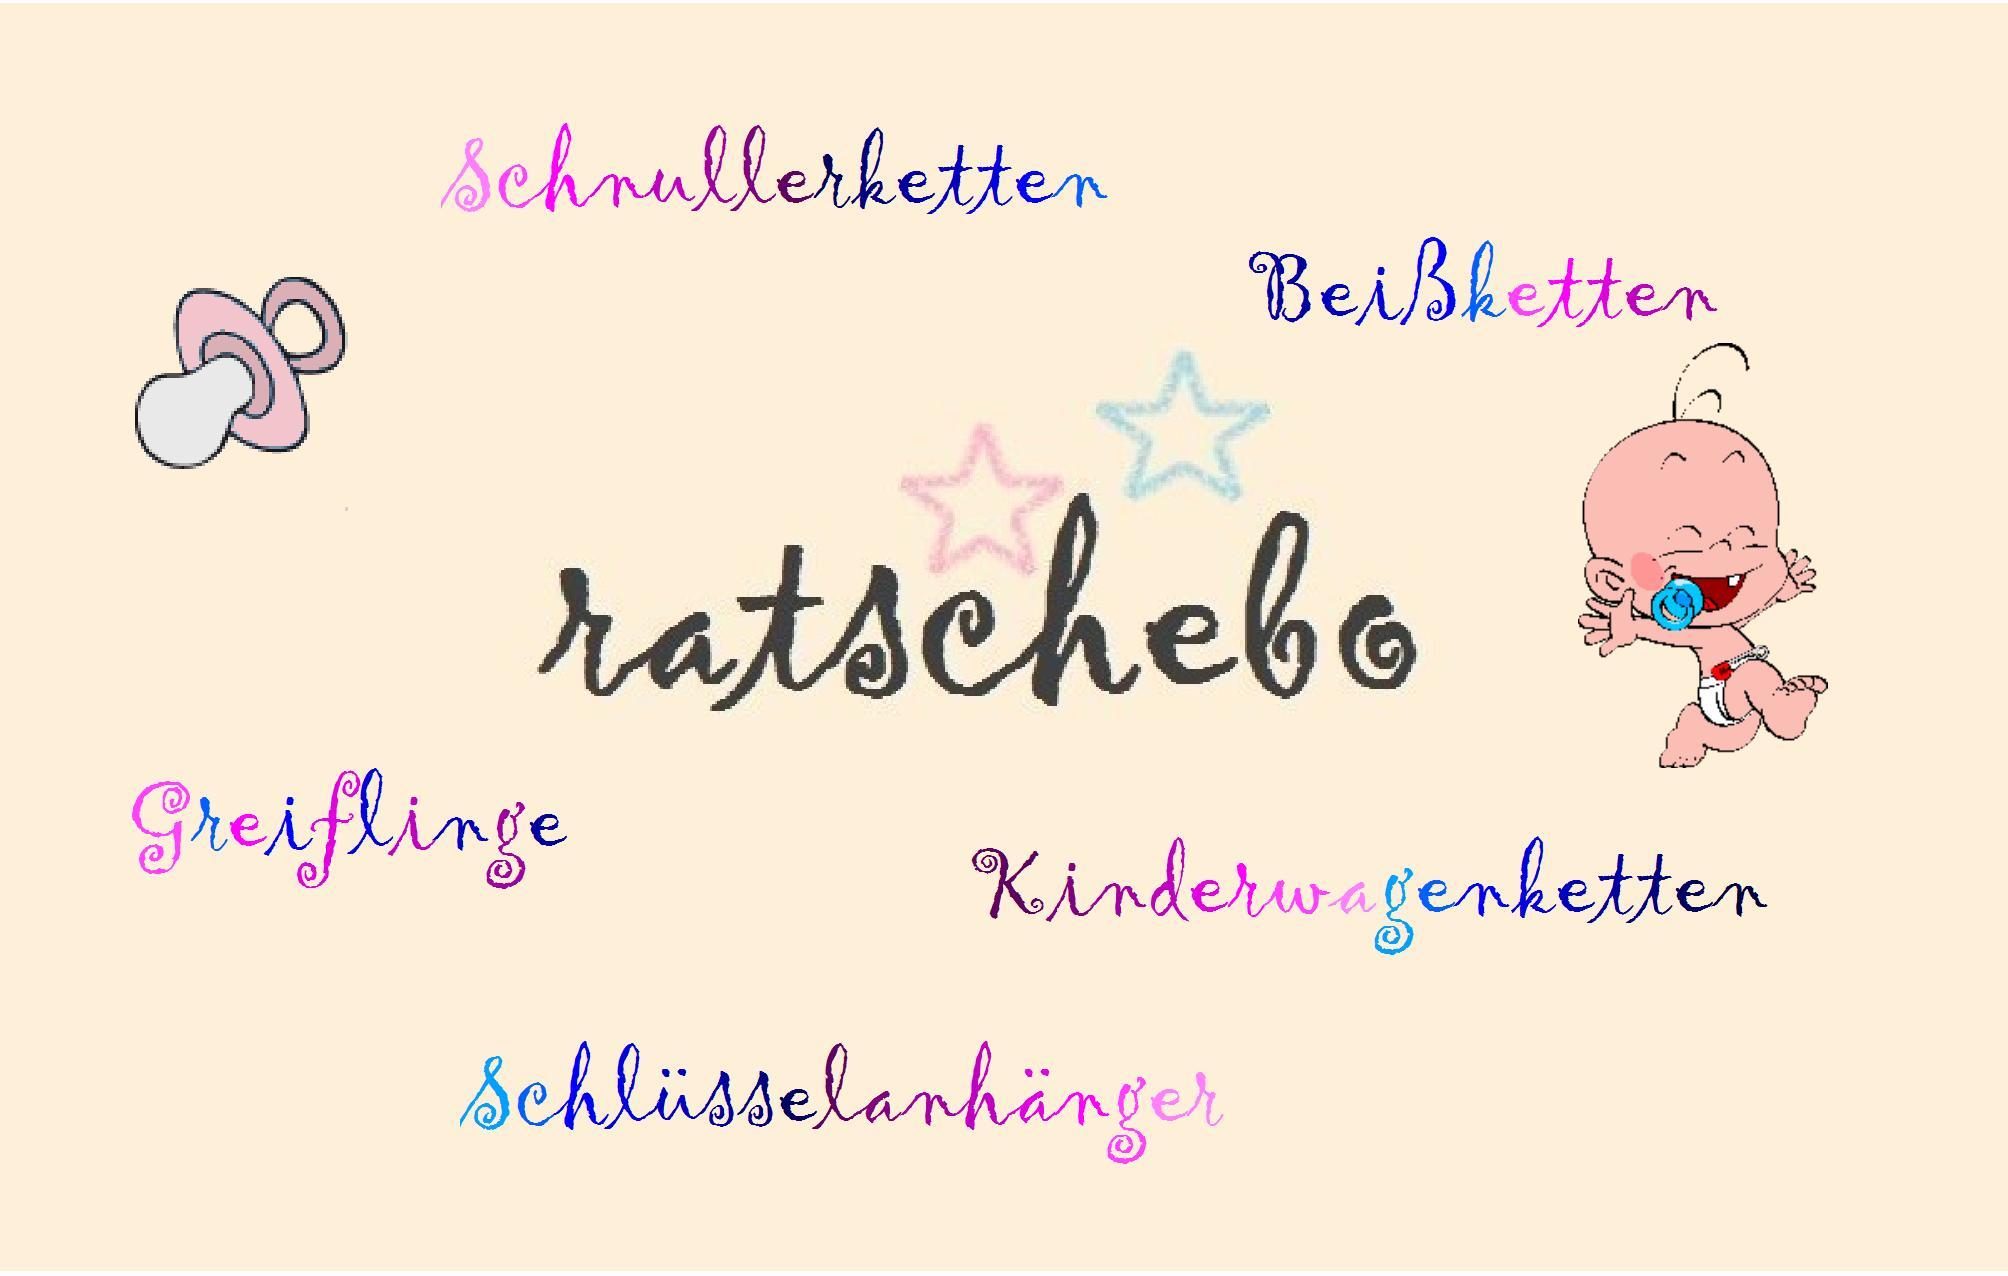 Ratschebo